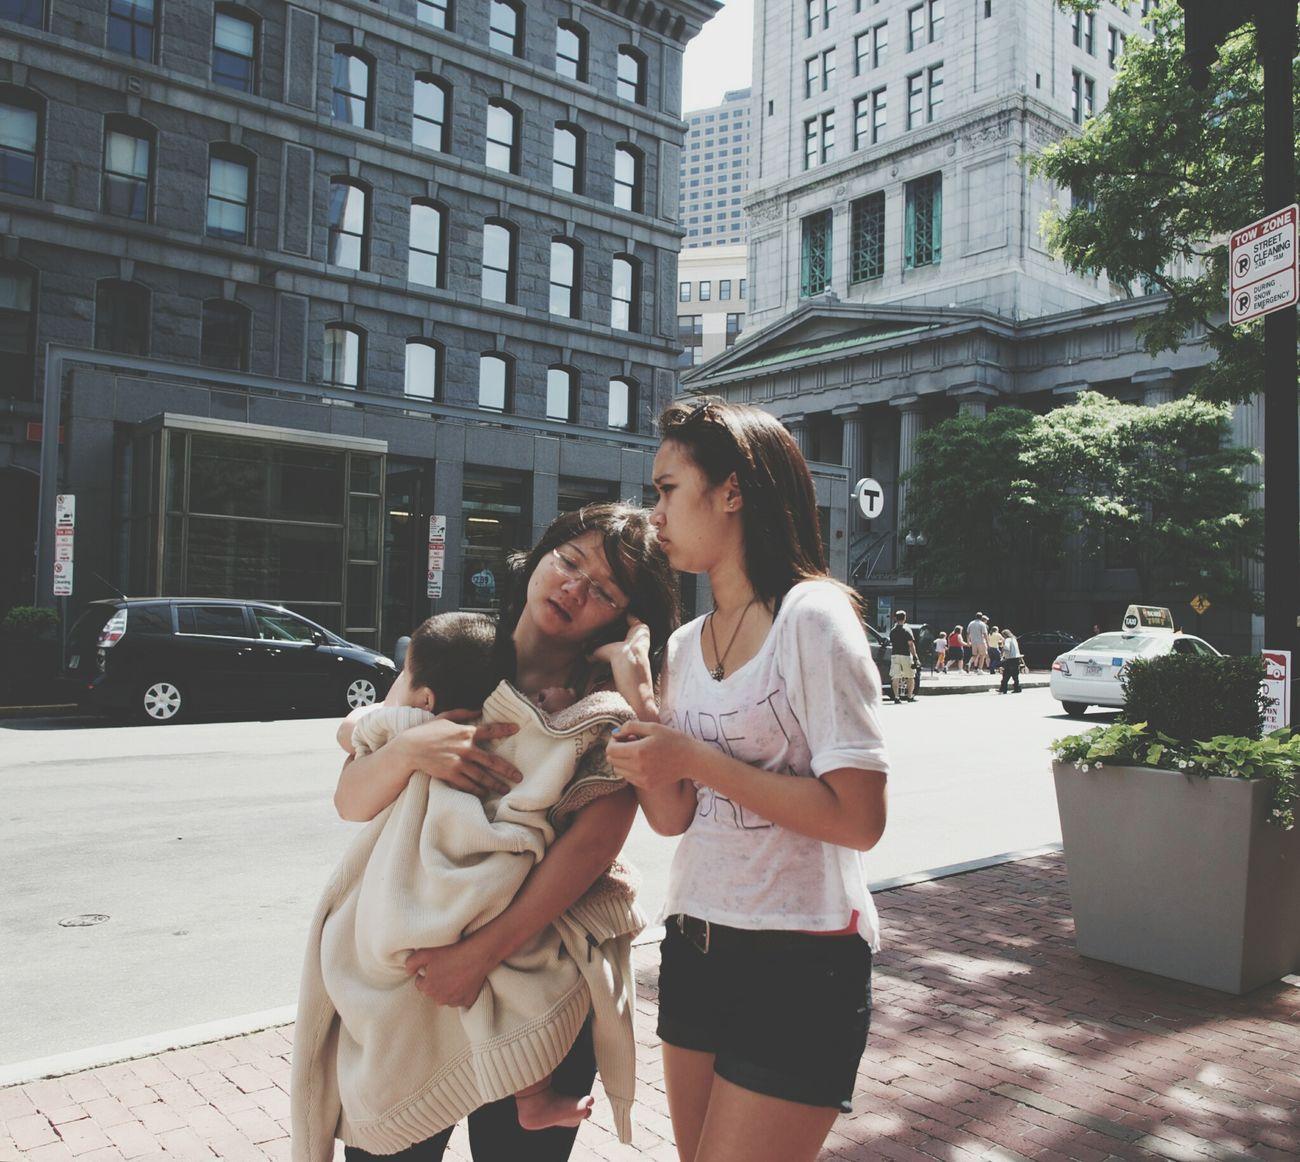 Multitasking Streetphotography The Street Photographer - 2015 EyeEm Awards